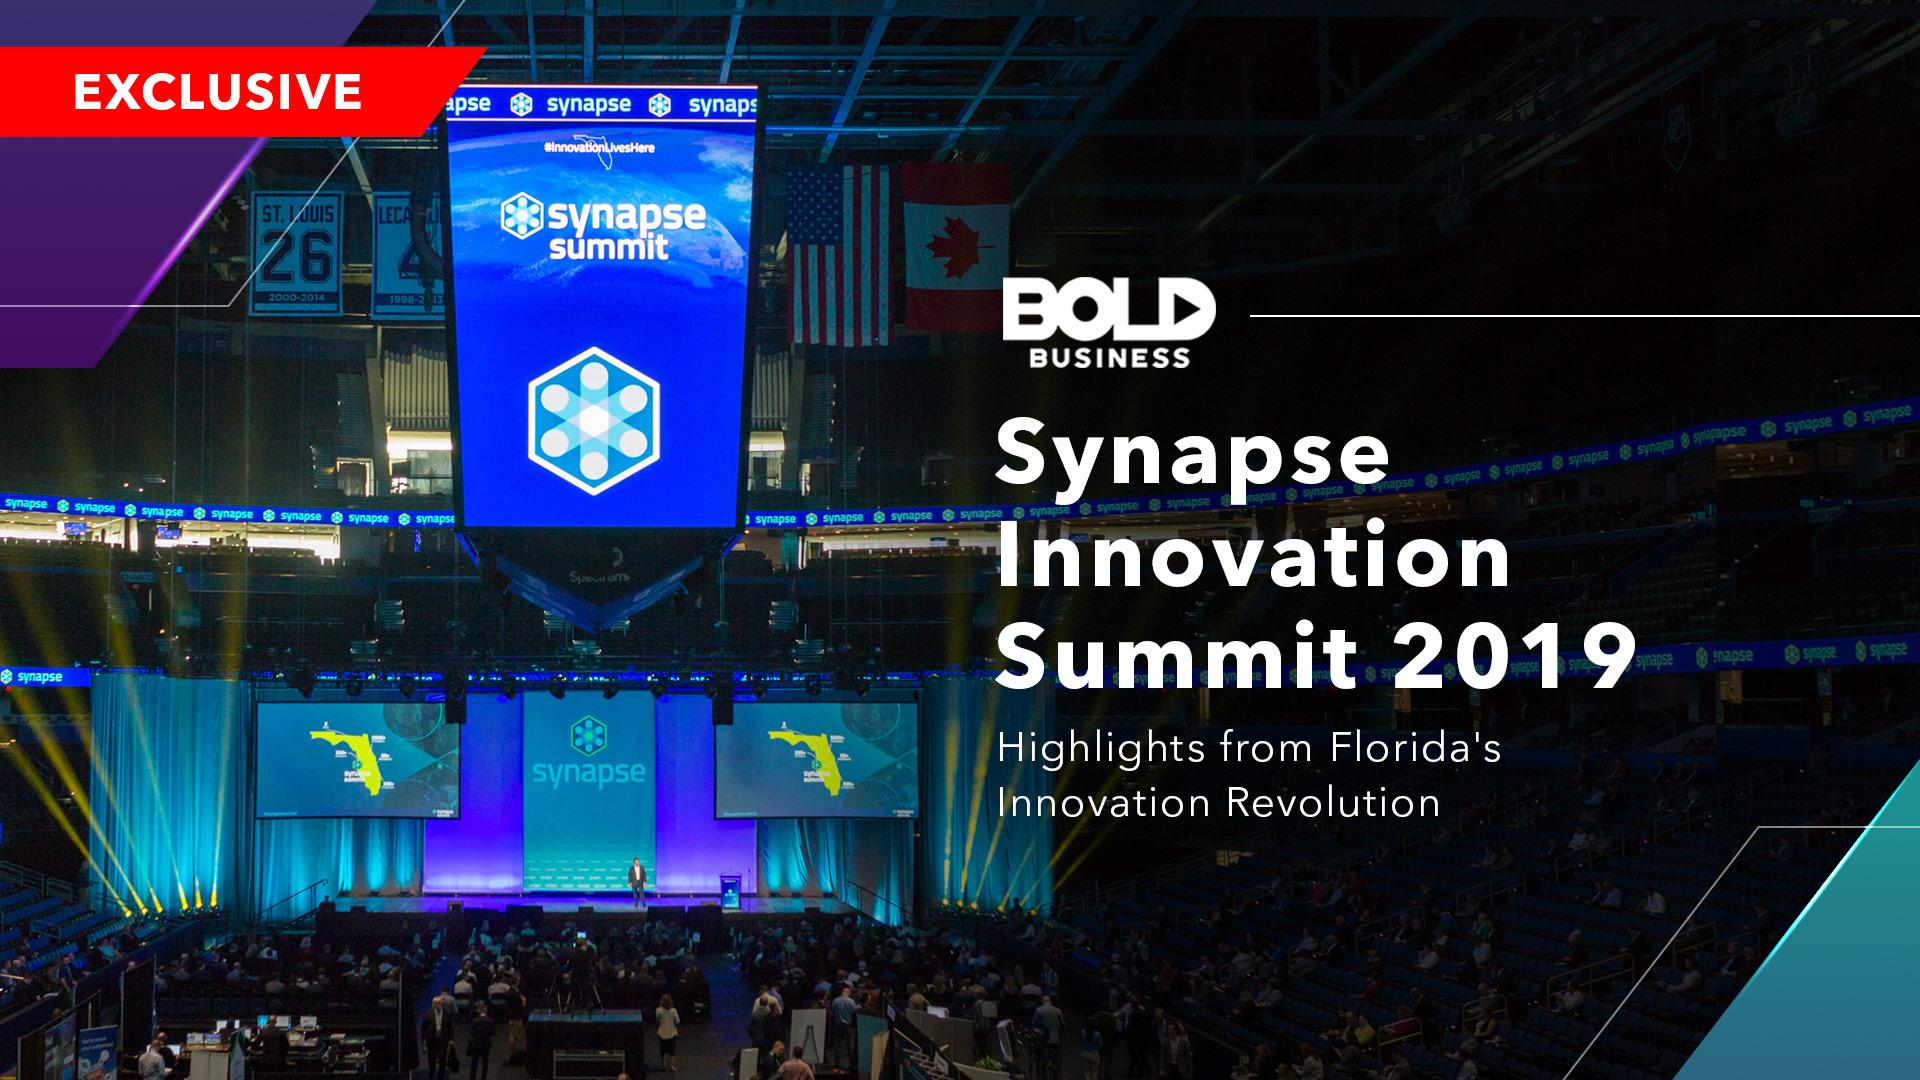 Synapse Innovation Summit 2019: Tampa Bay's Innovation Hub